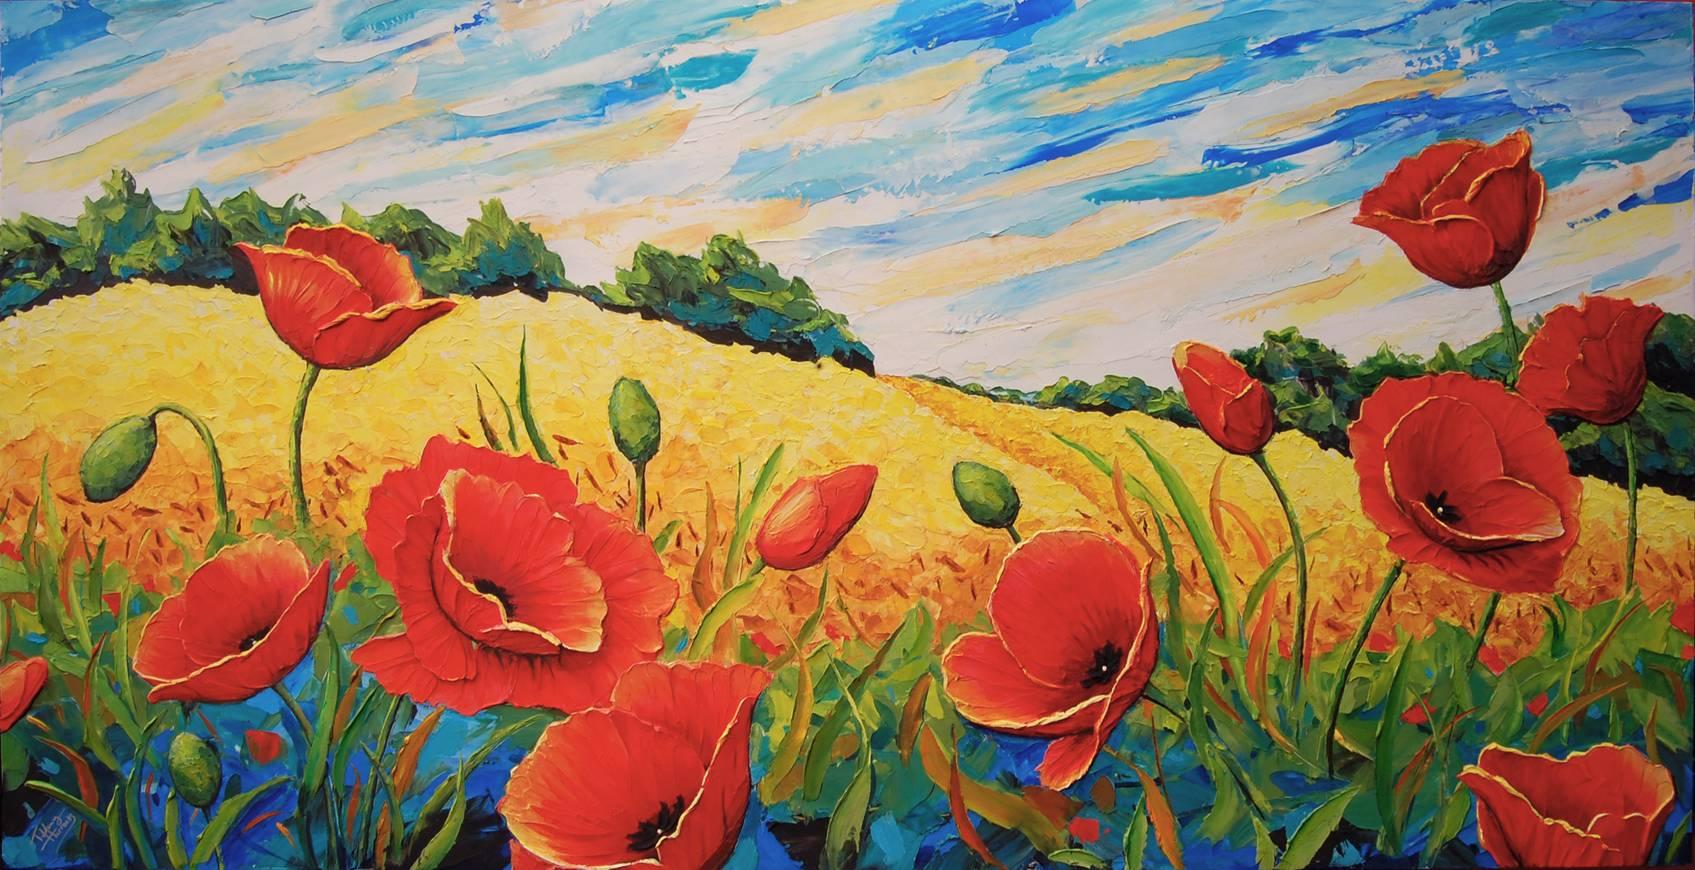 Wheatfield Poppies on summer day.  82 x 42